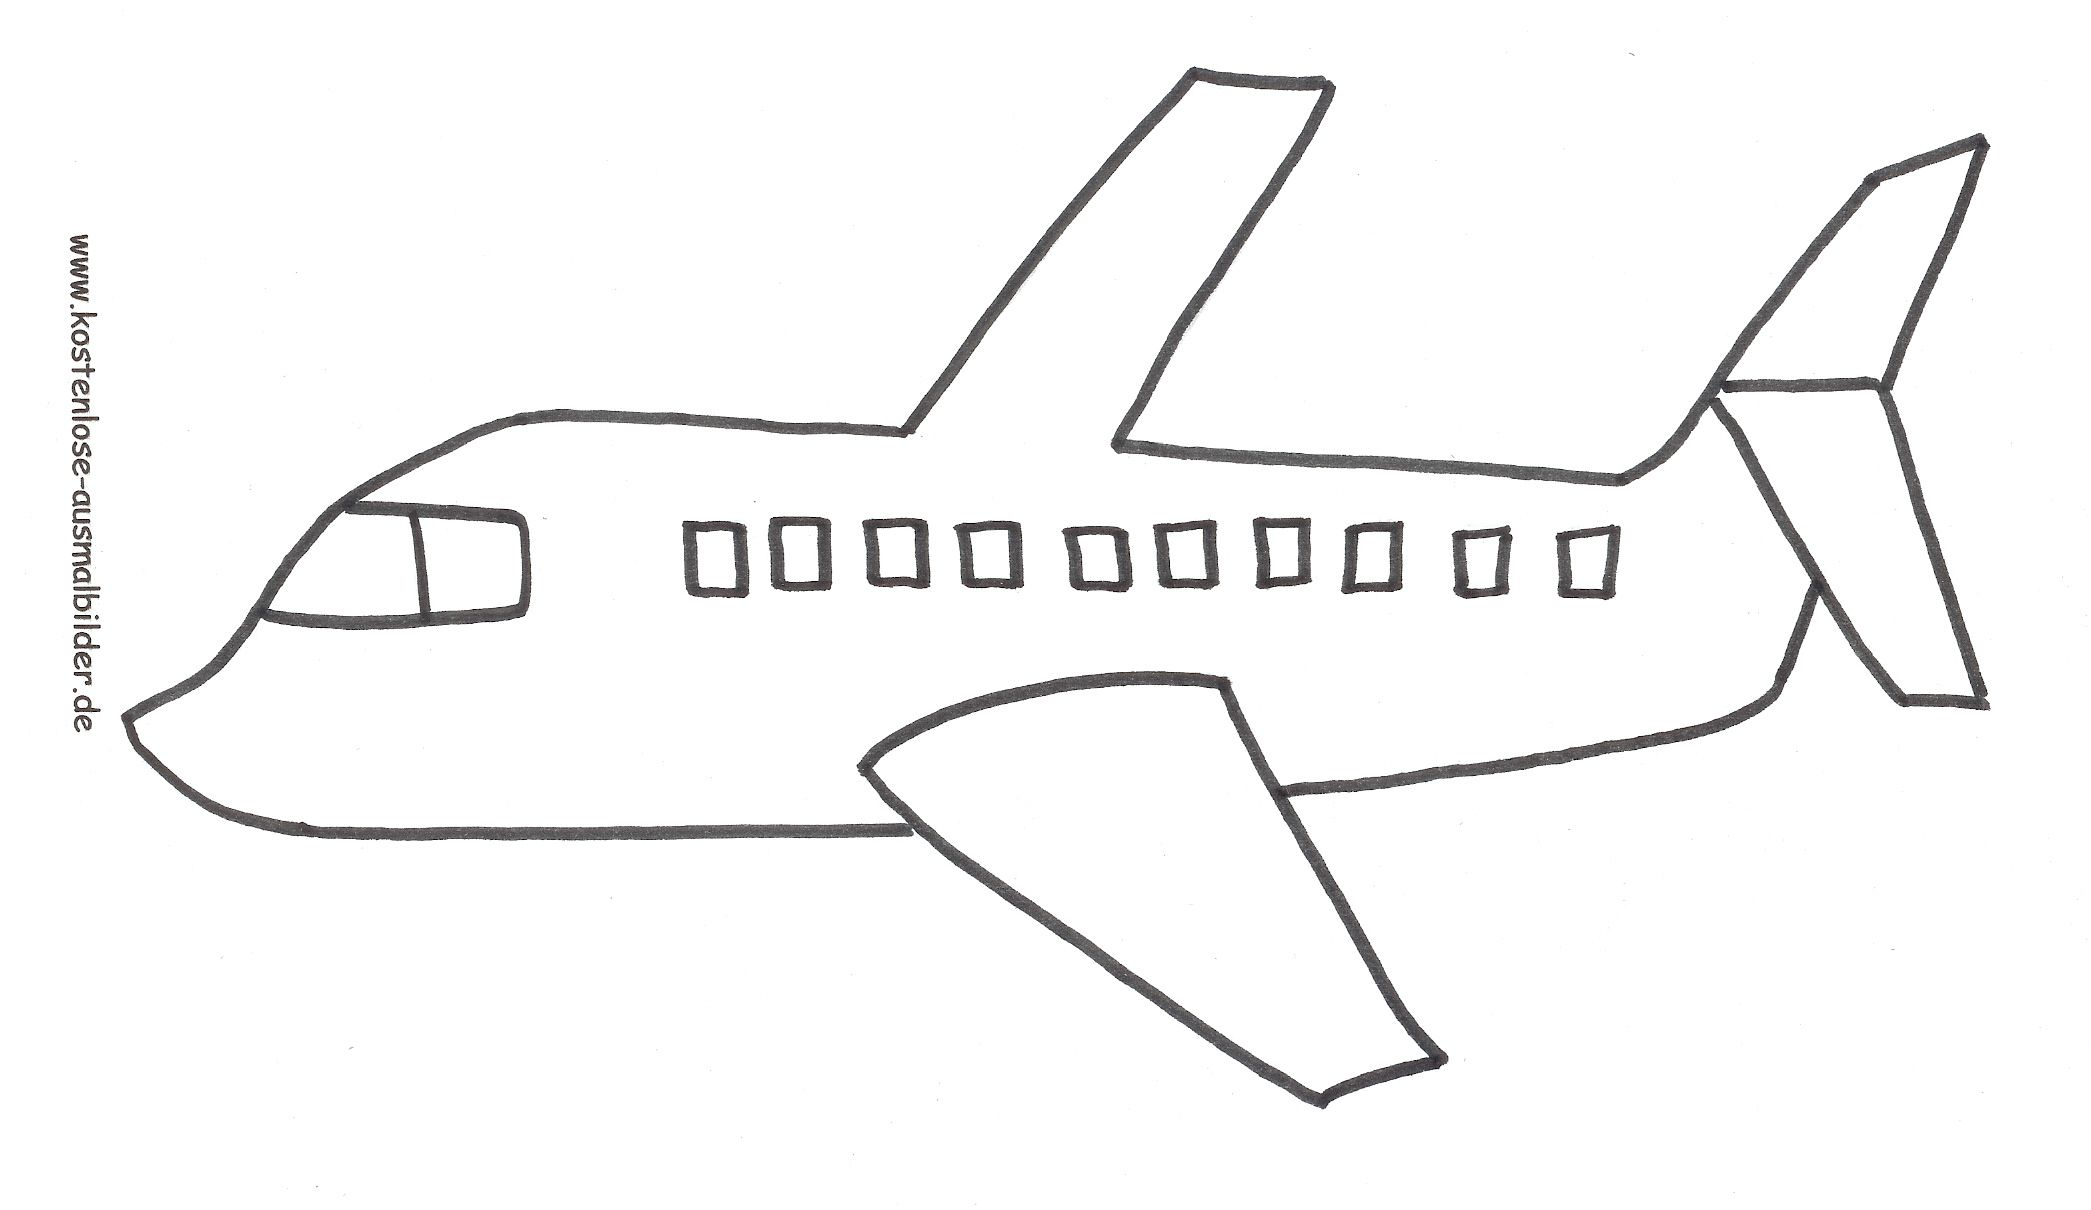 flugzeug malvorlage 06 | 18 Geburtstag | Pinterest | Flugzeug ...